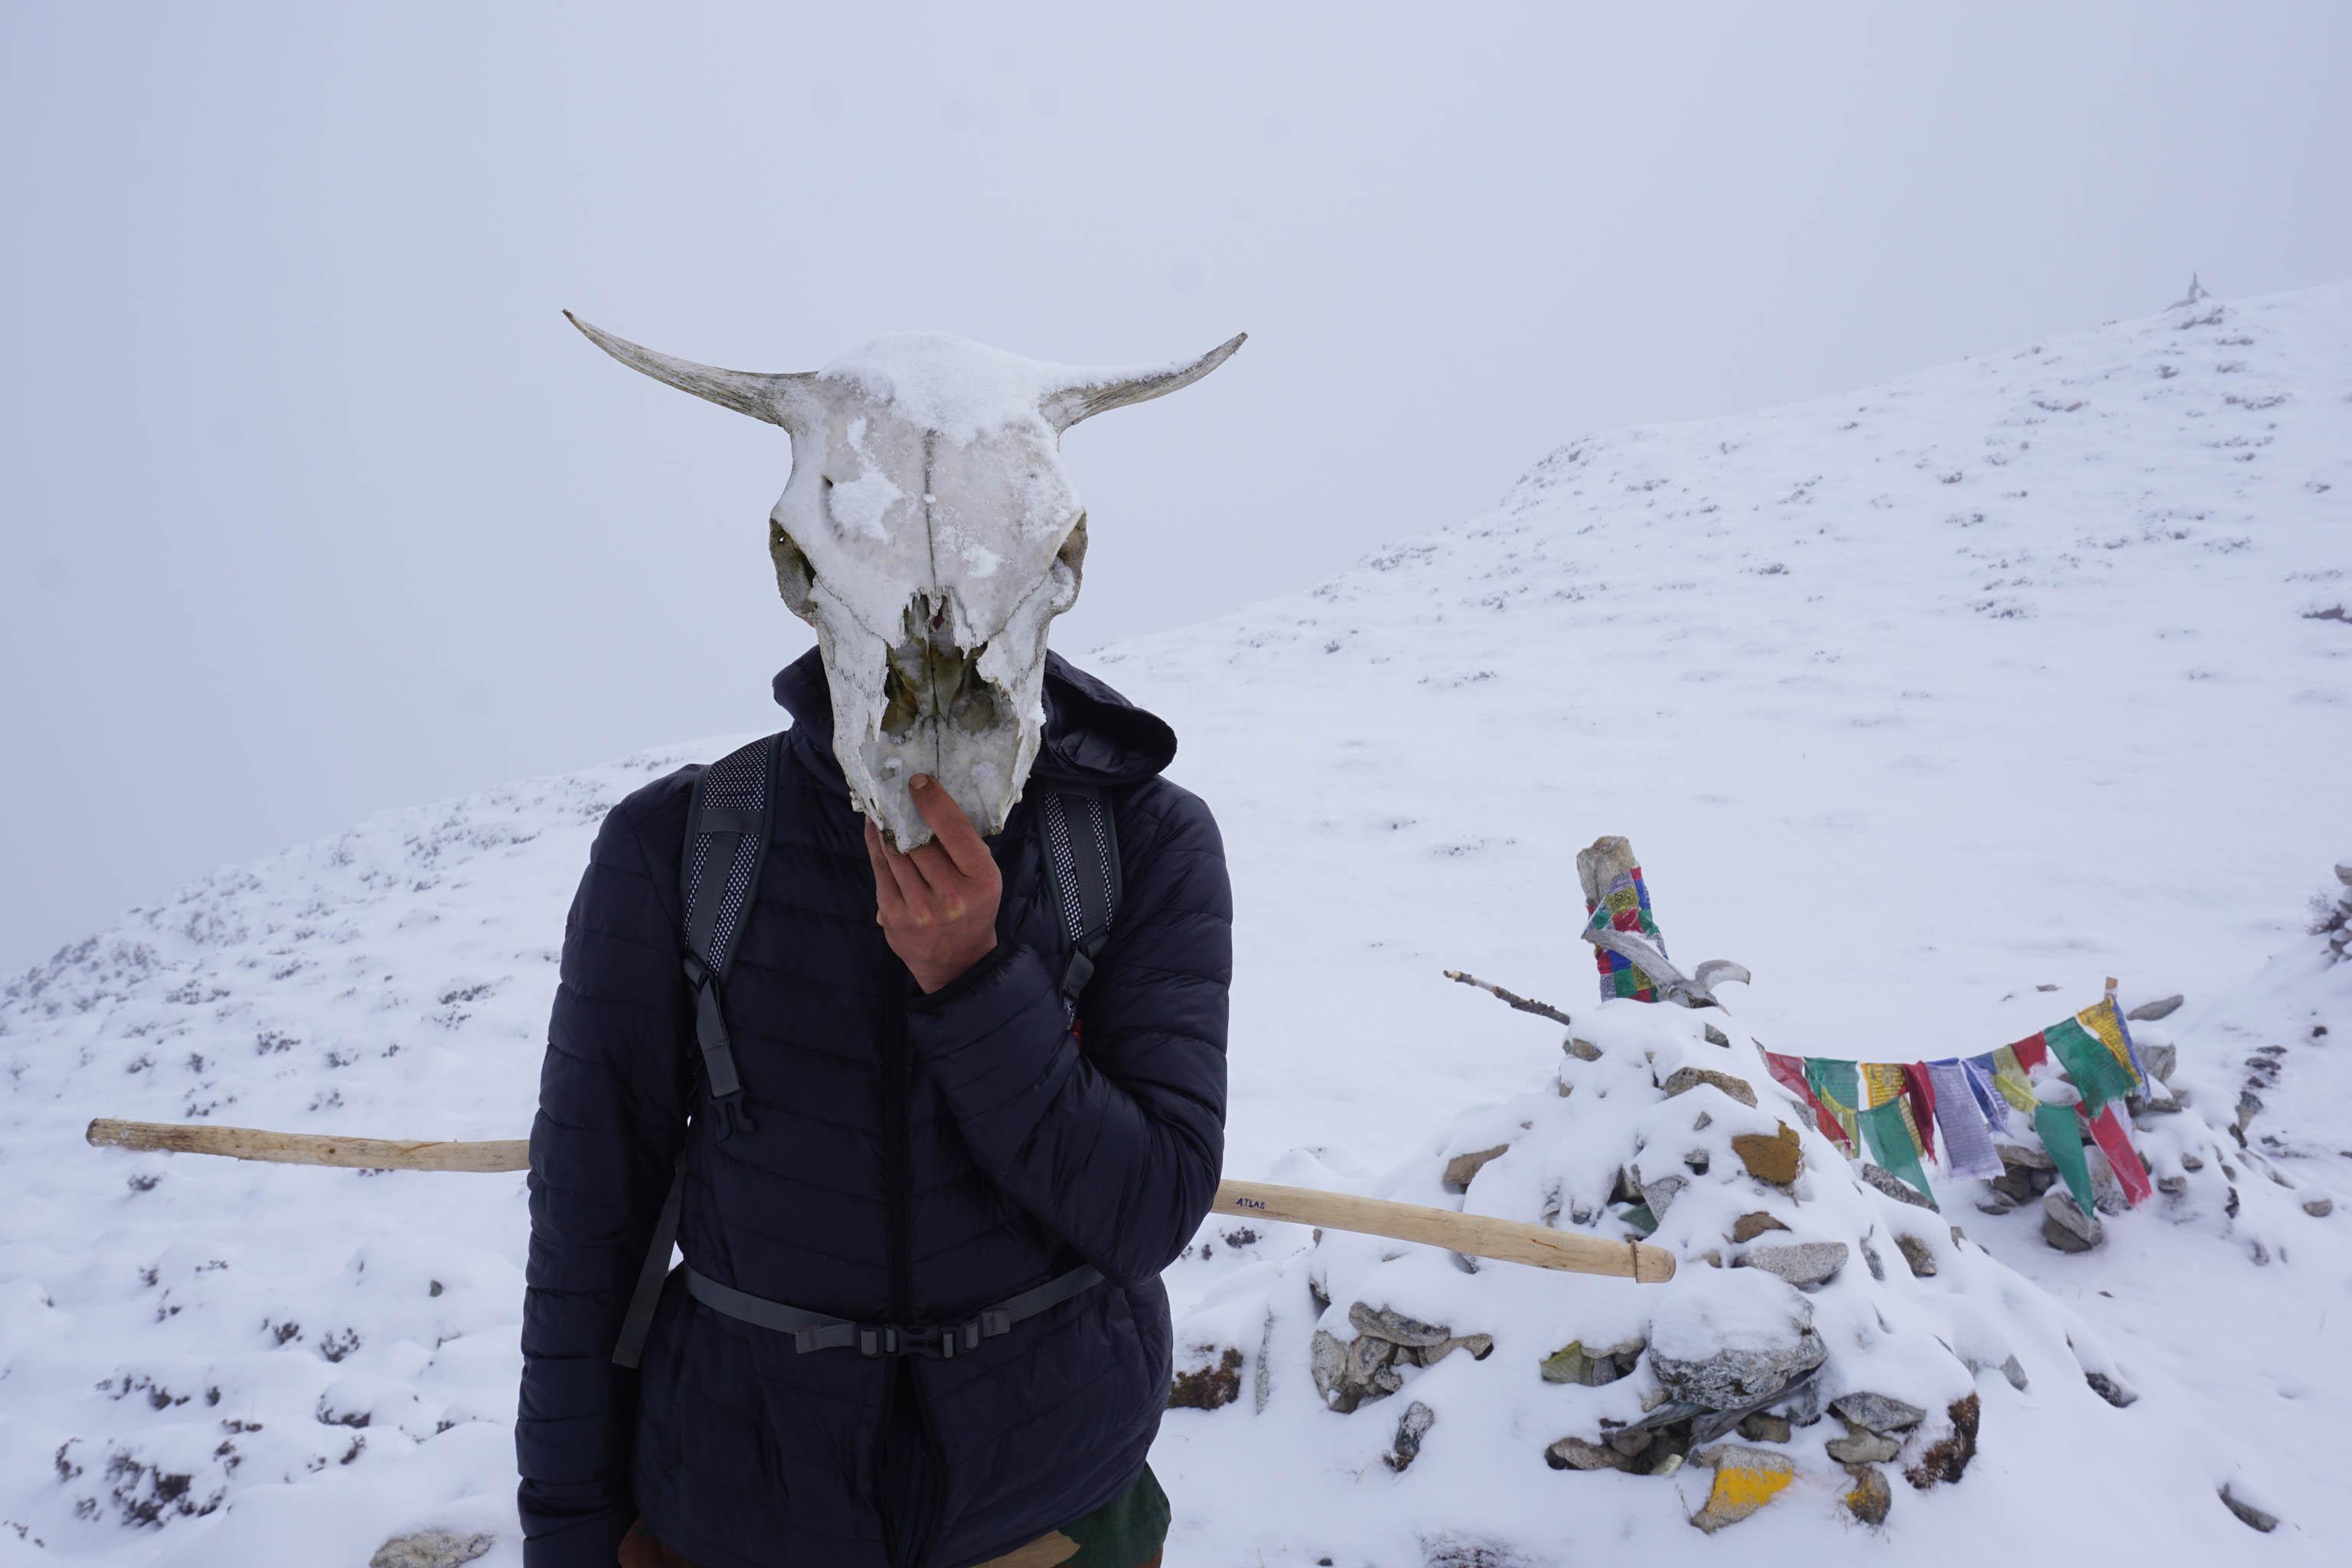 Travel Himalayas Bhutan trekking thru-hiking